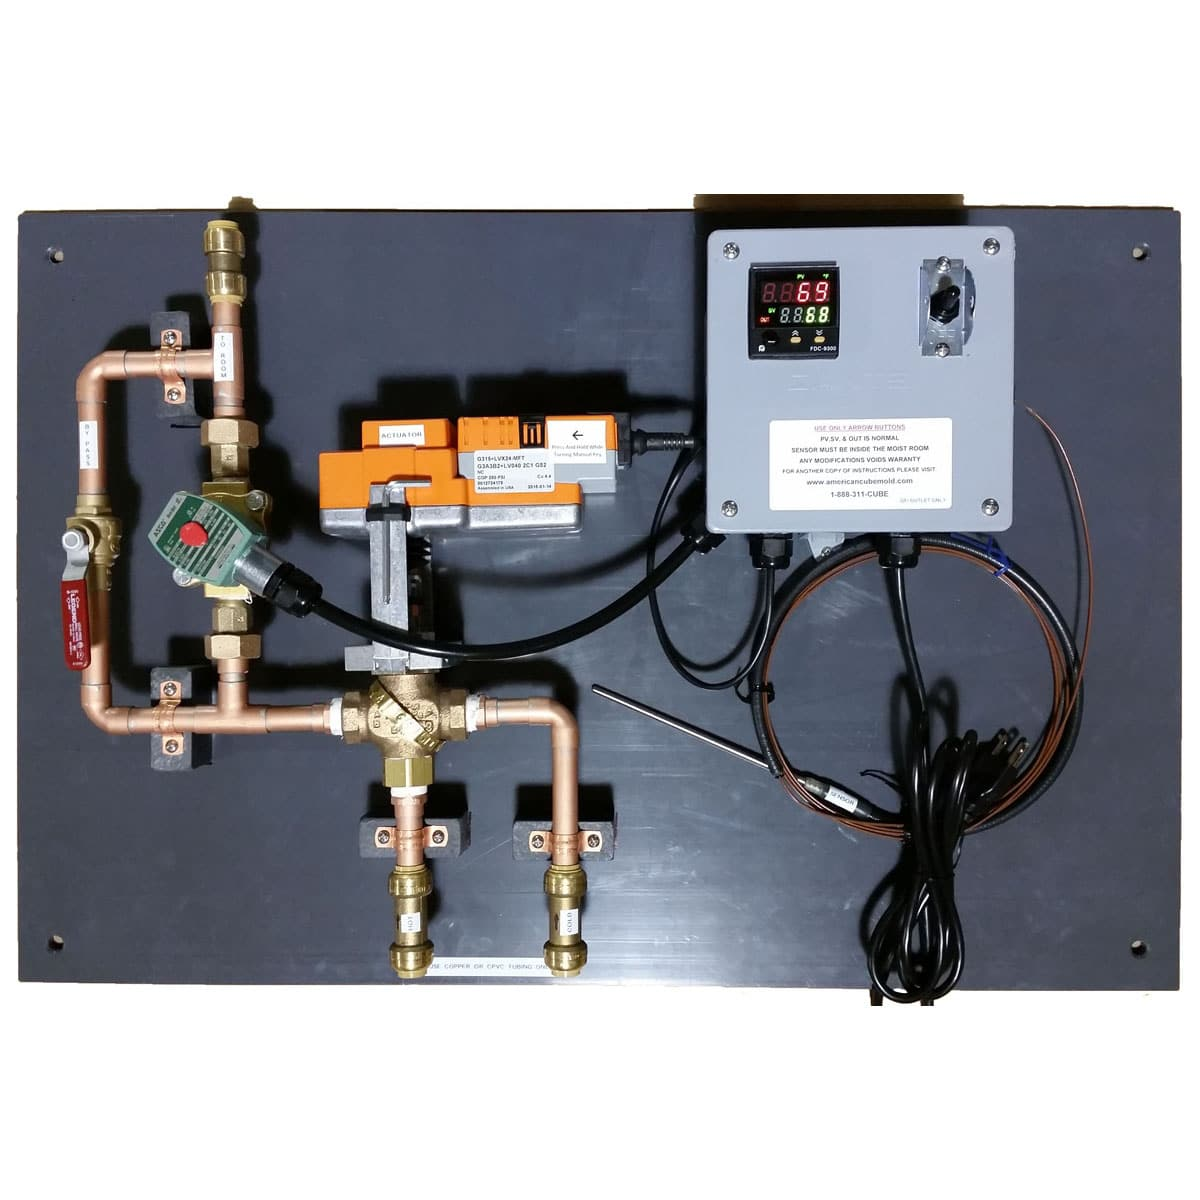 moisture room control system